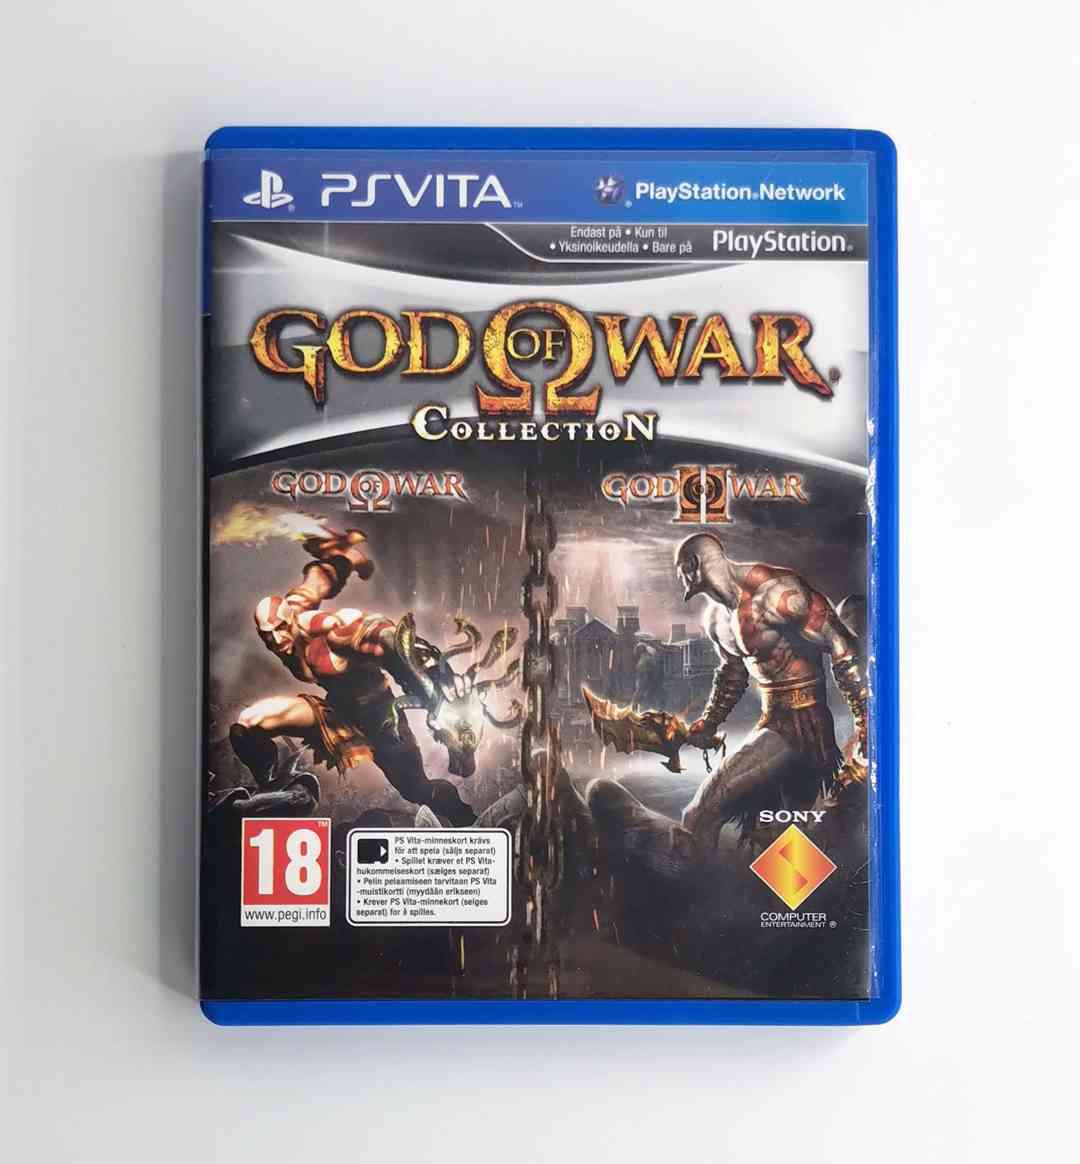 PS Vita - God of War Collection - foto 1